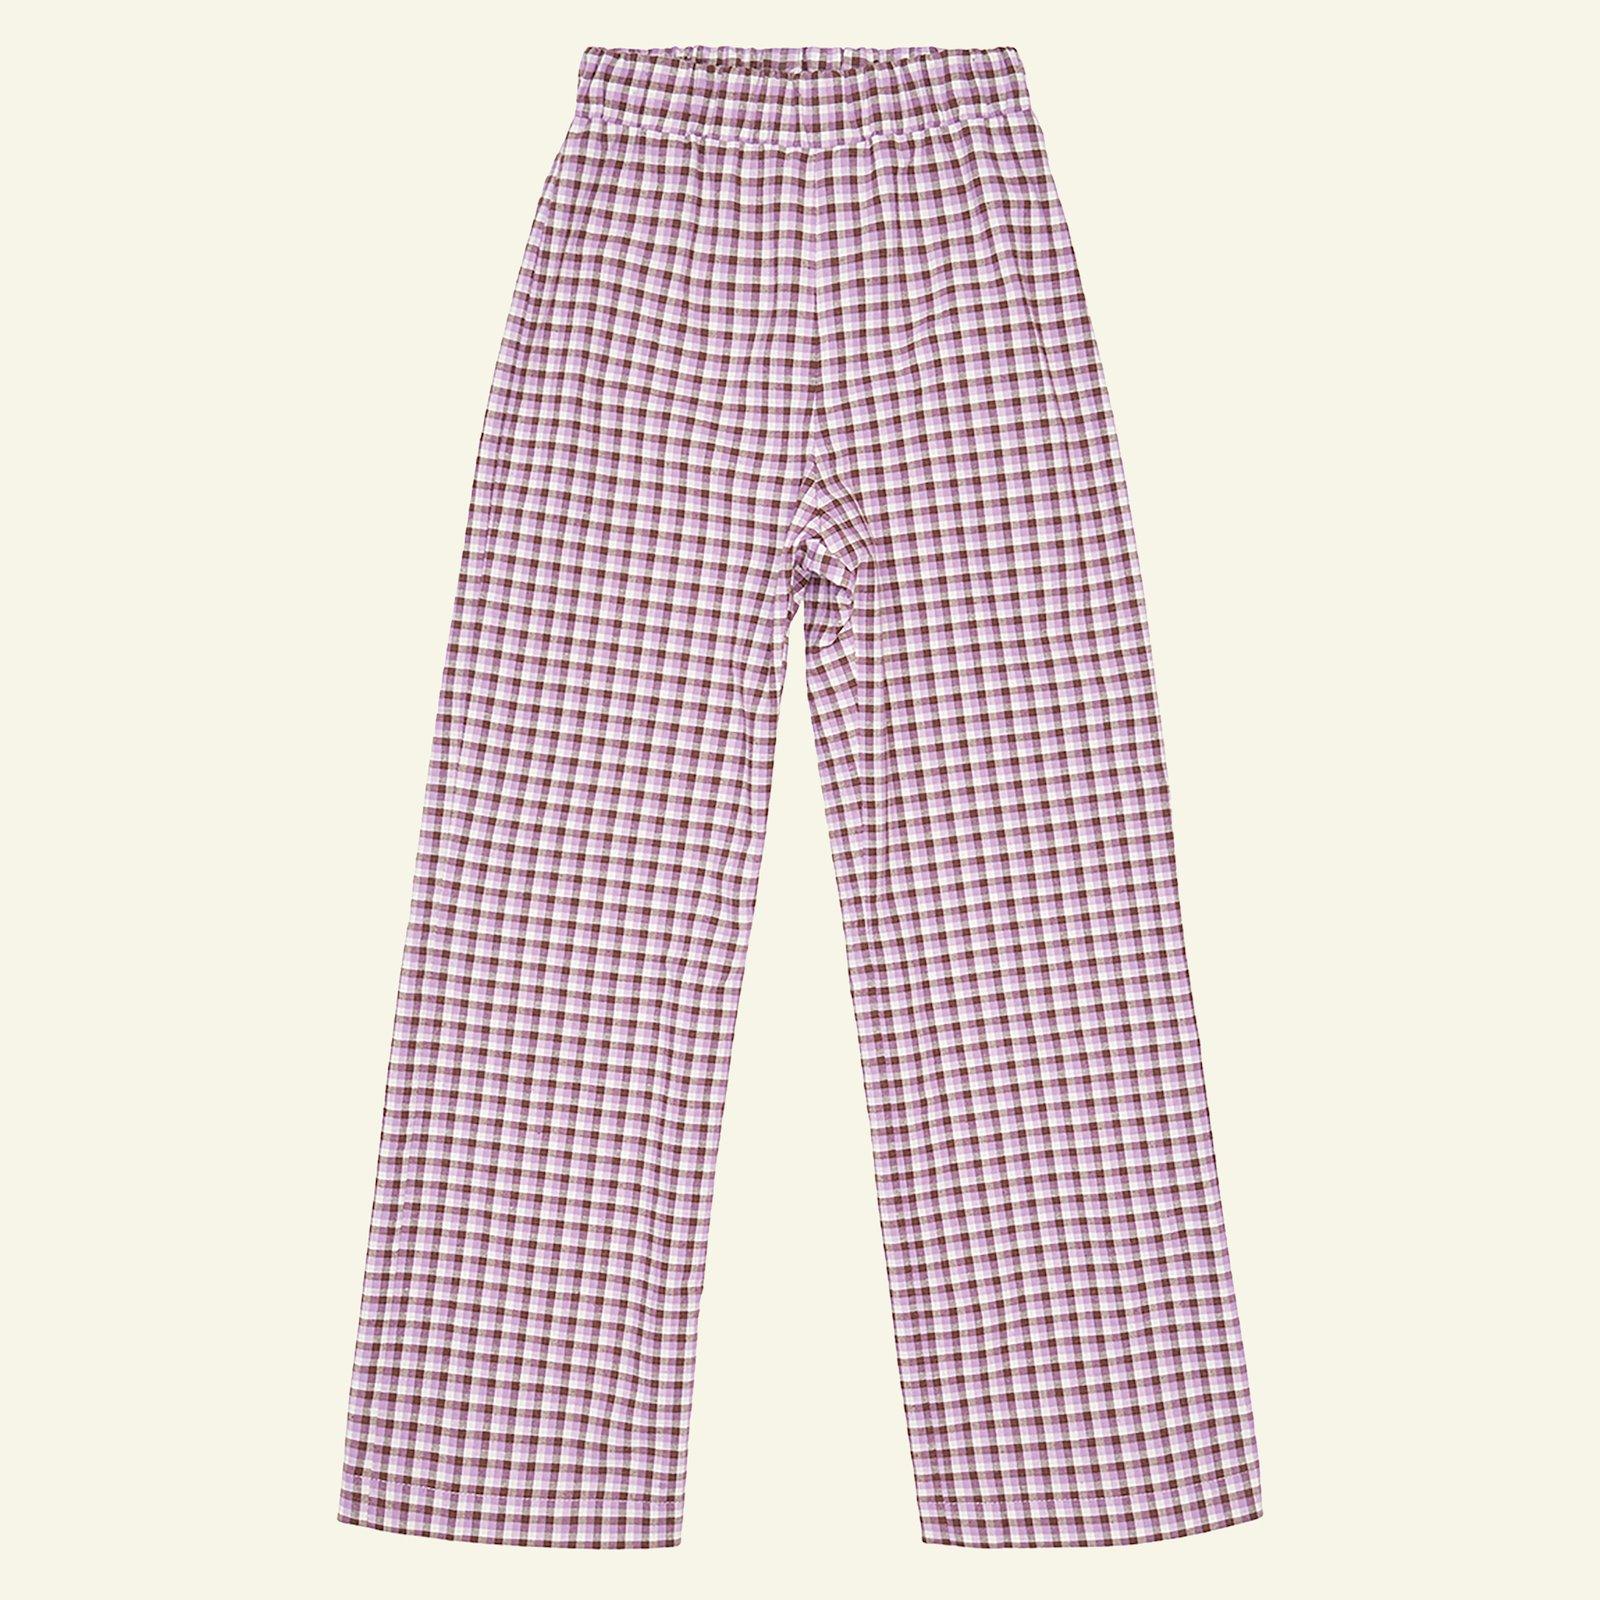 High waist and wide lege trouser, 140/10 p60034_501795_sskit